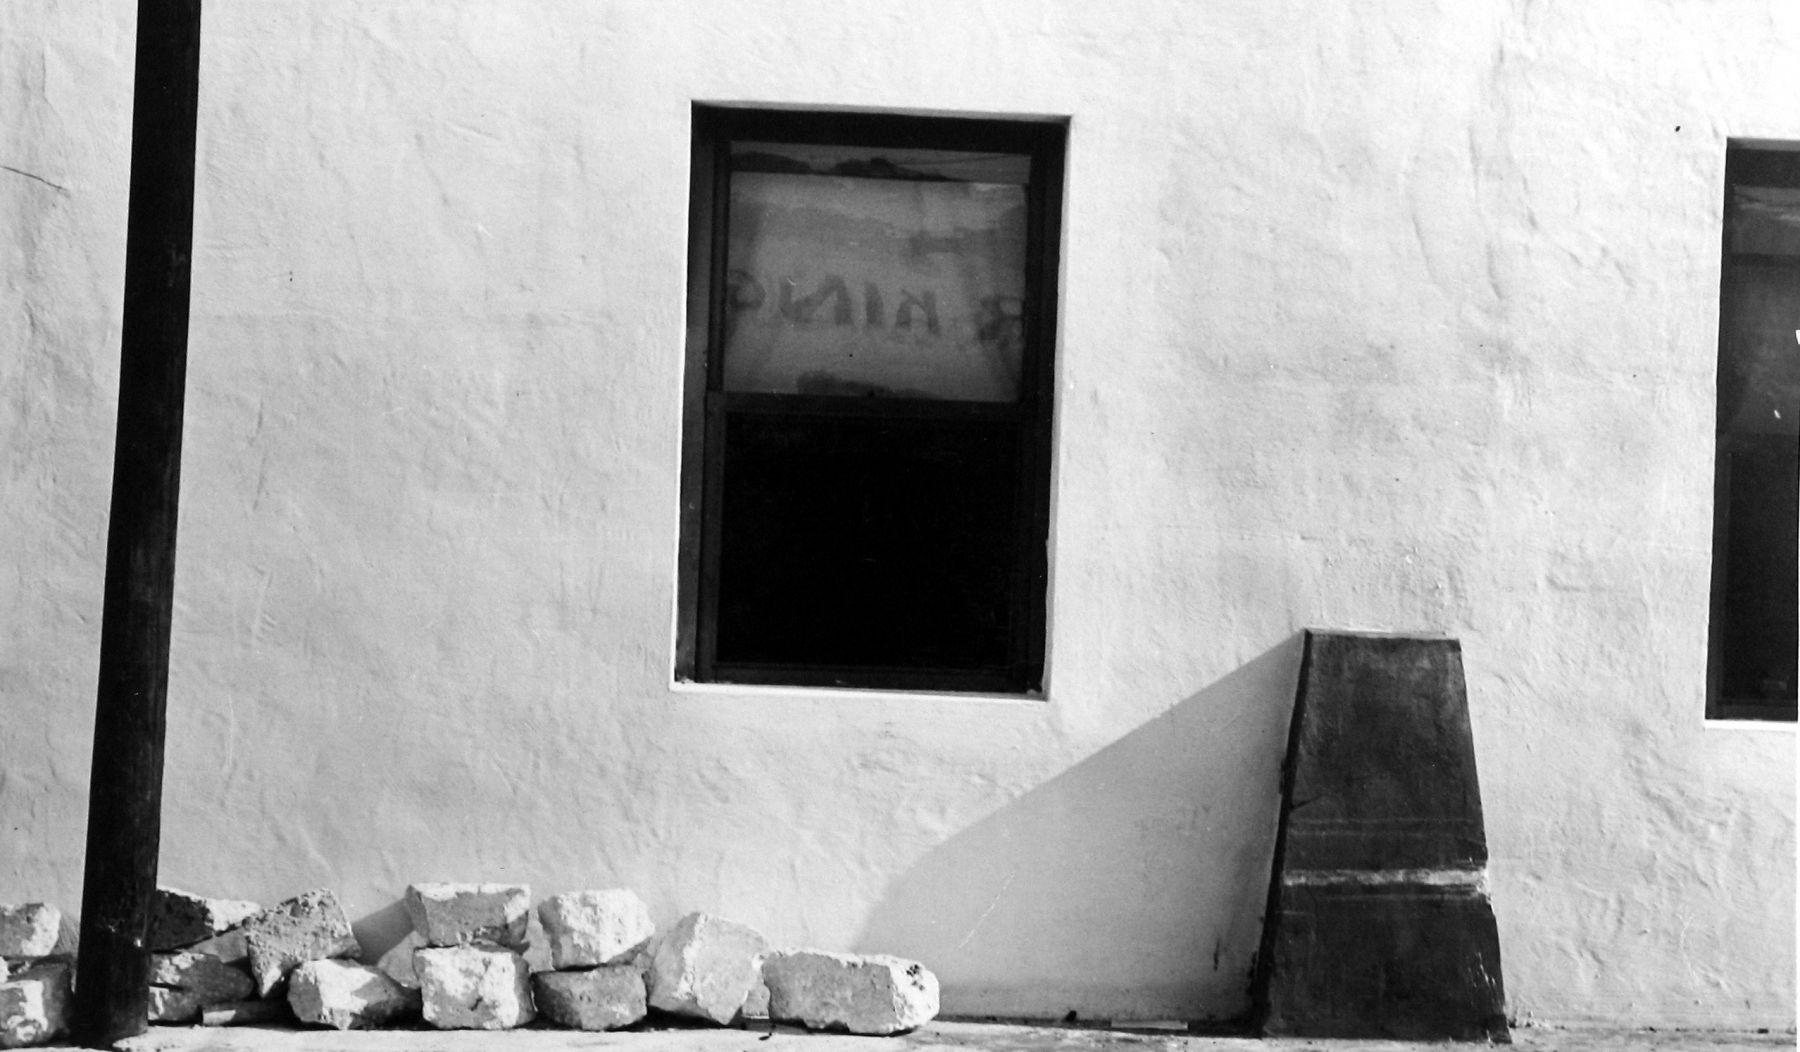 Arnold Newman - Window, West Palm Beach, FL, 1940 - Howard Greenberg Gallery - 2018